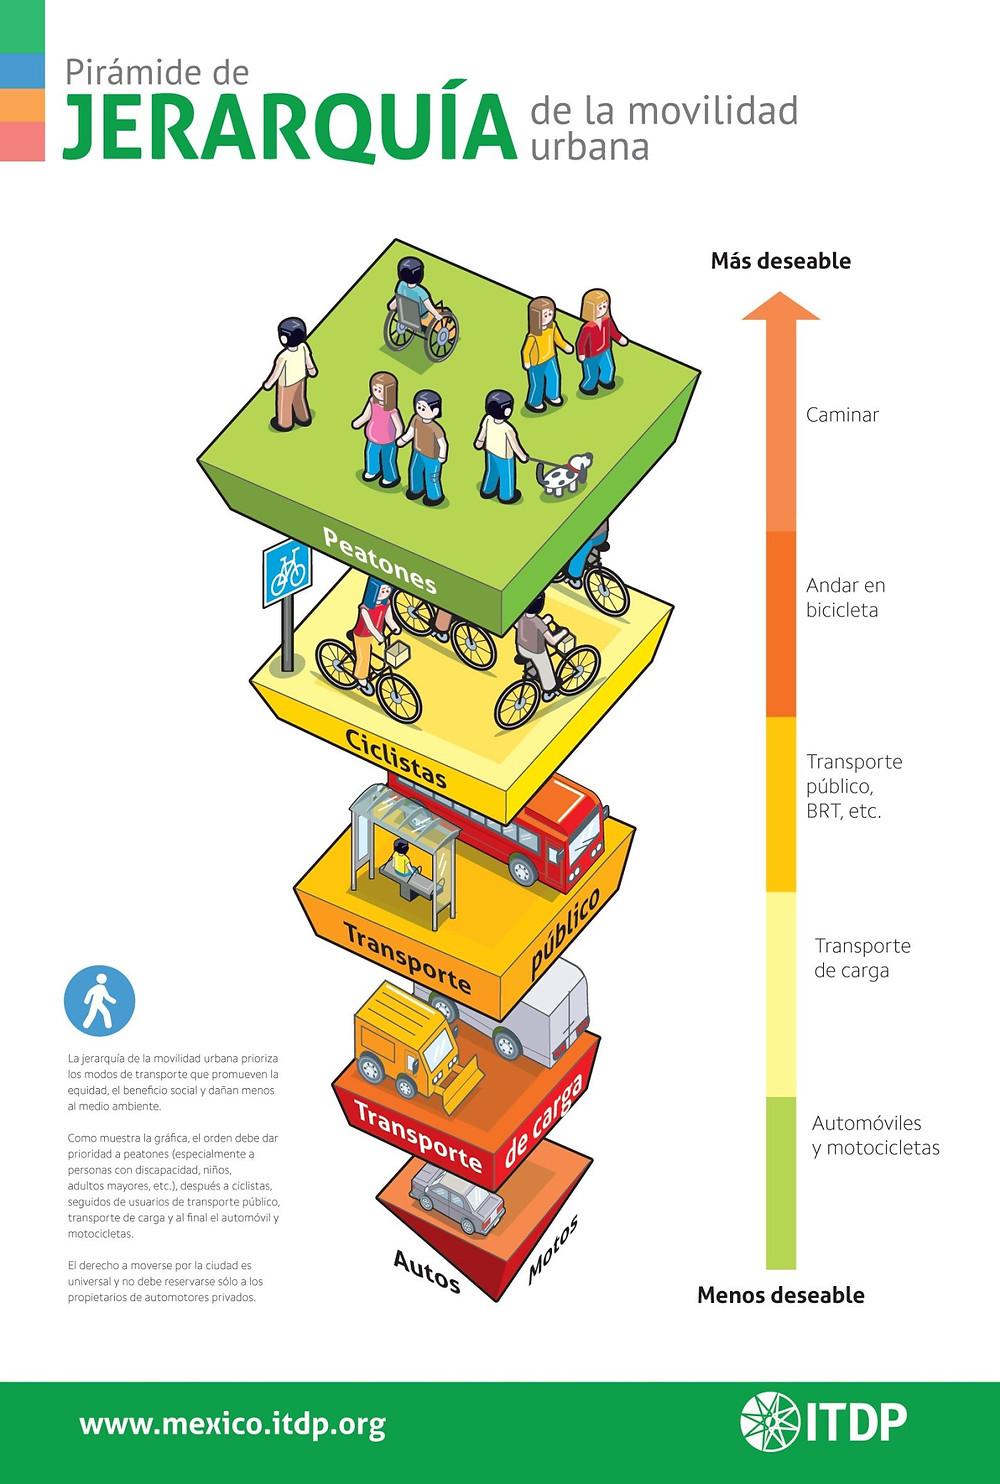 piramide de la movilidad itdp